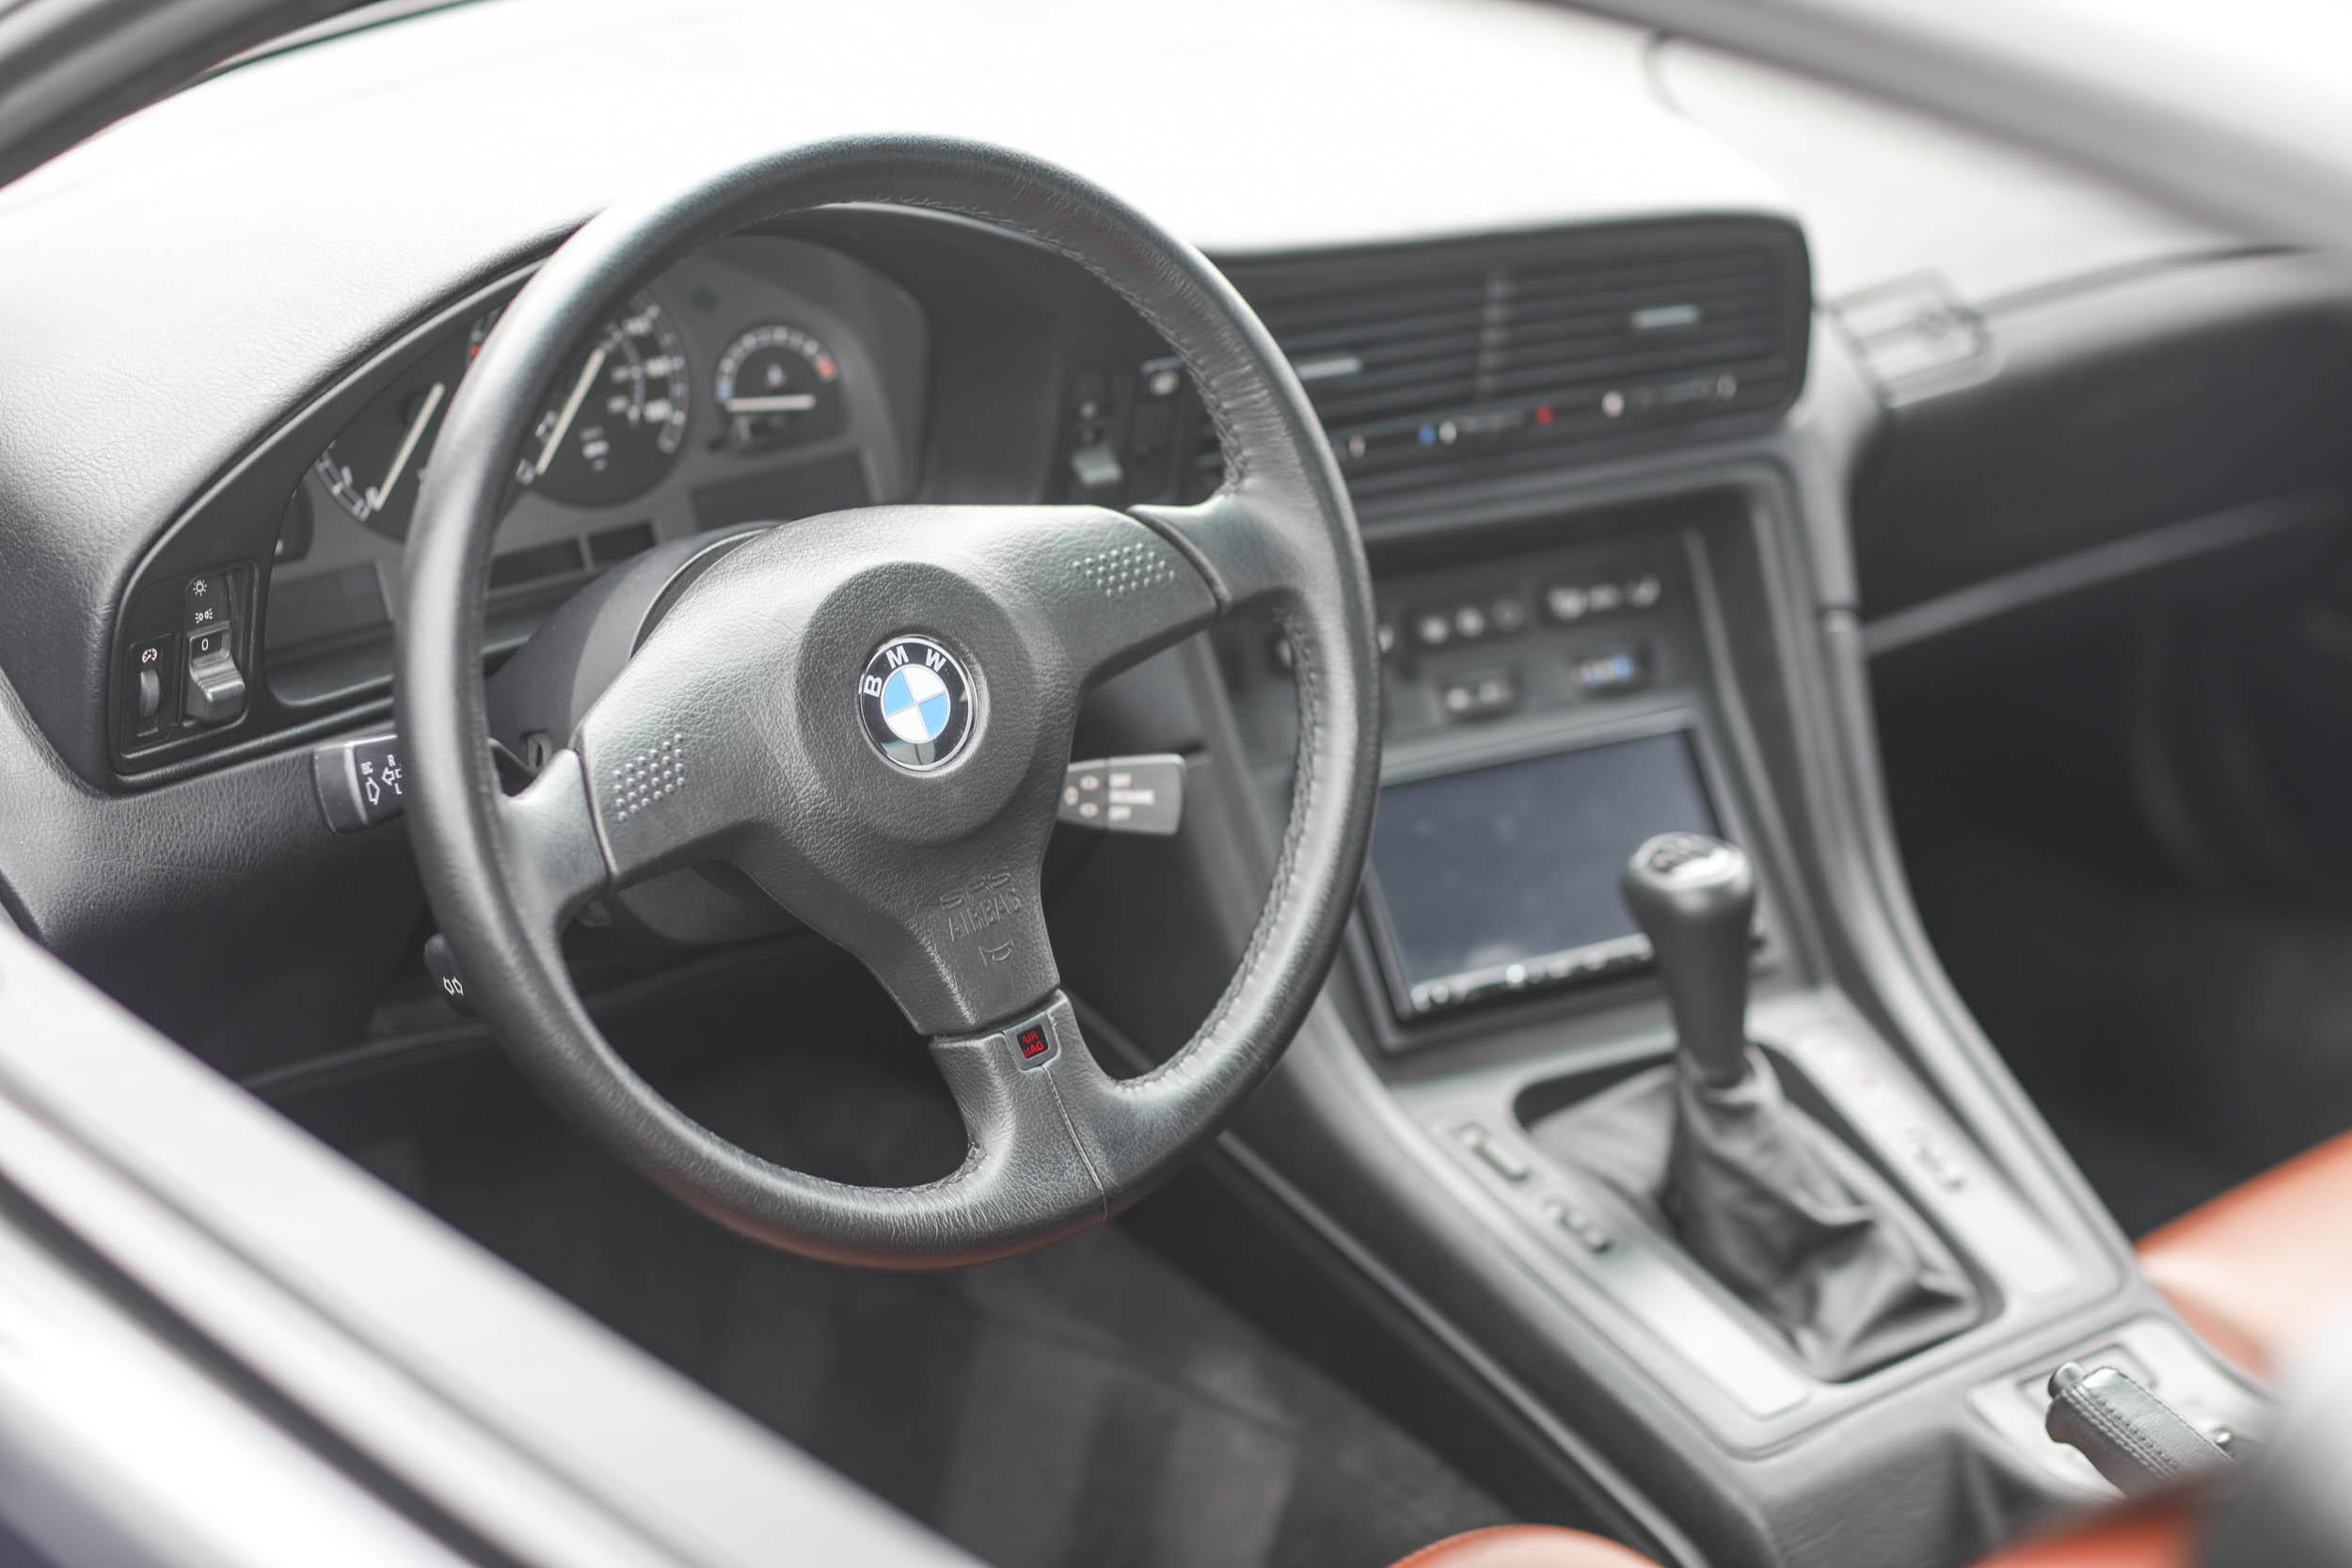 1993 BMW 850Ci steering wheel